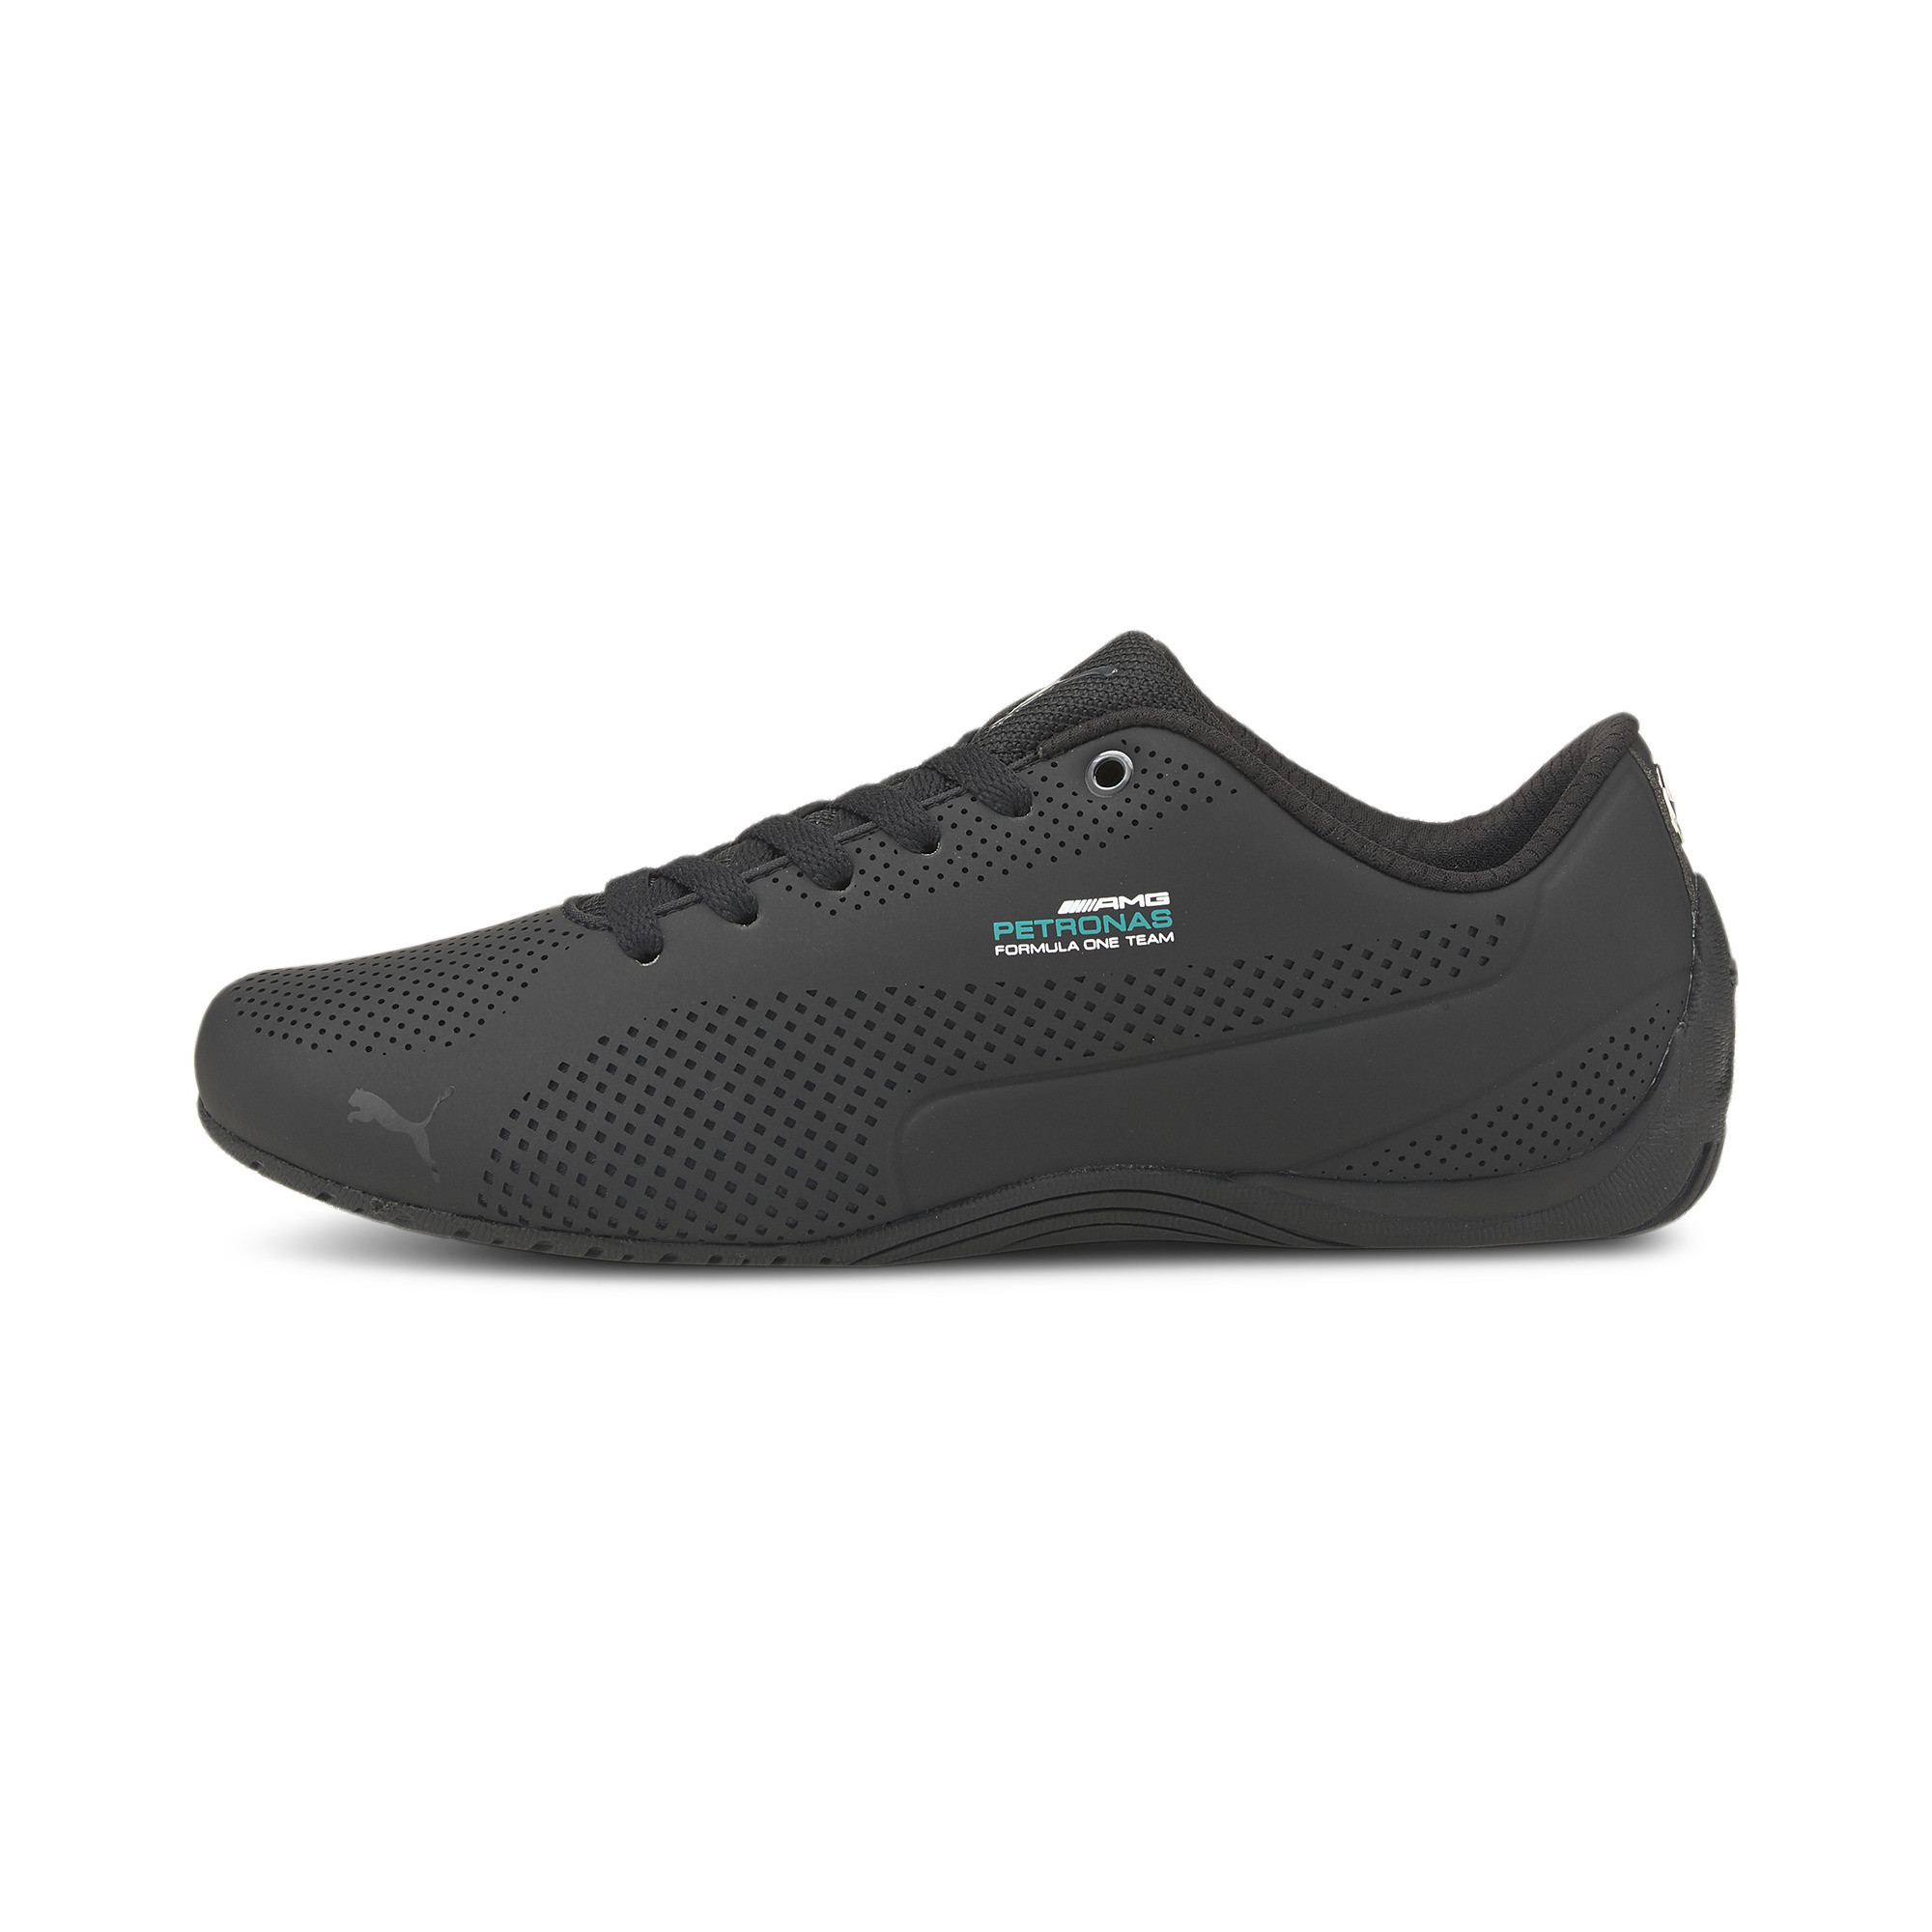 Indexbild 11 - PUMA MERCEDES AMG PETRONAS Drift Cat Ultra Sneaker Unisex Schuhe Neu